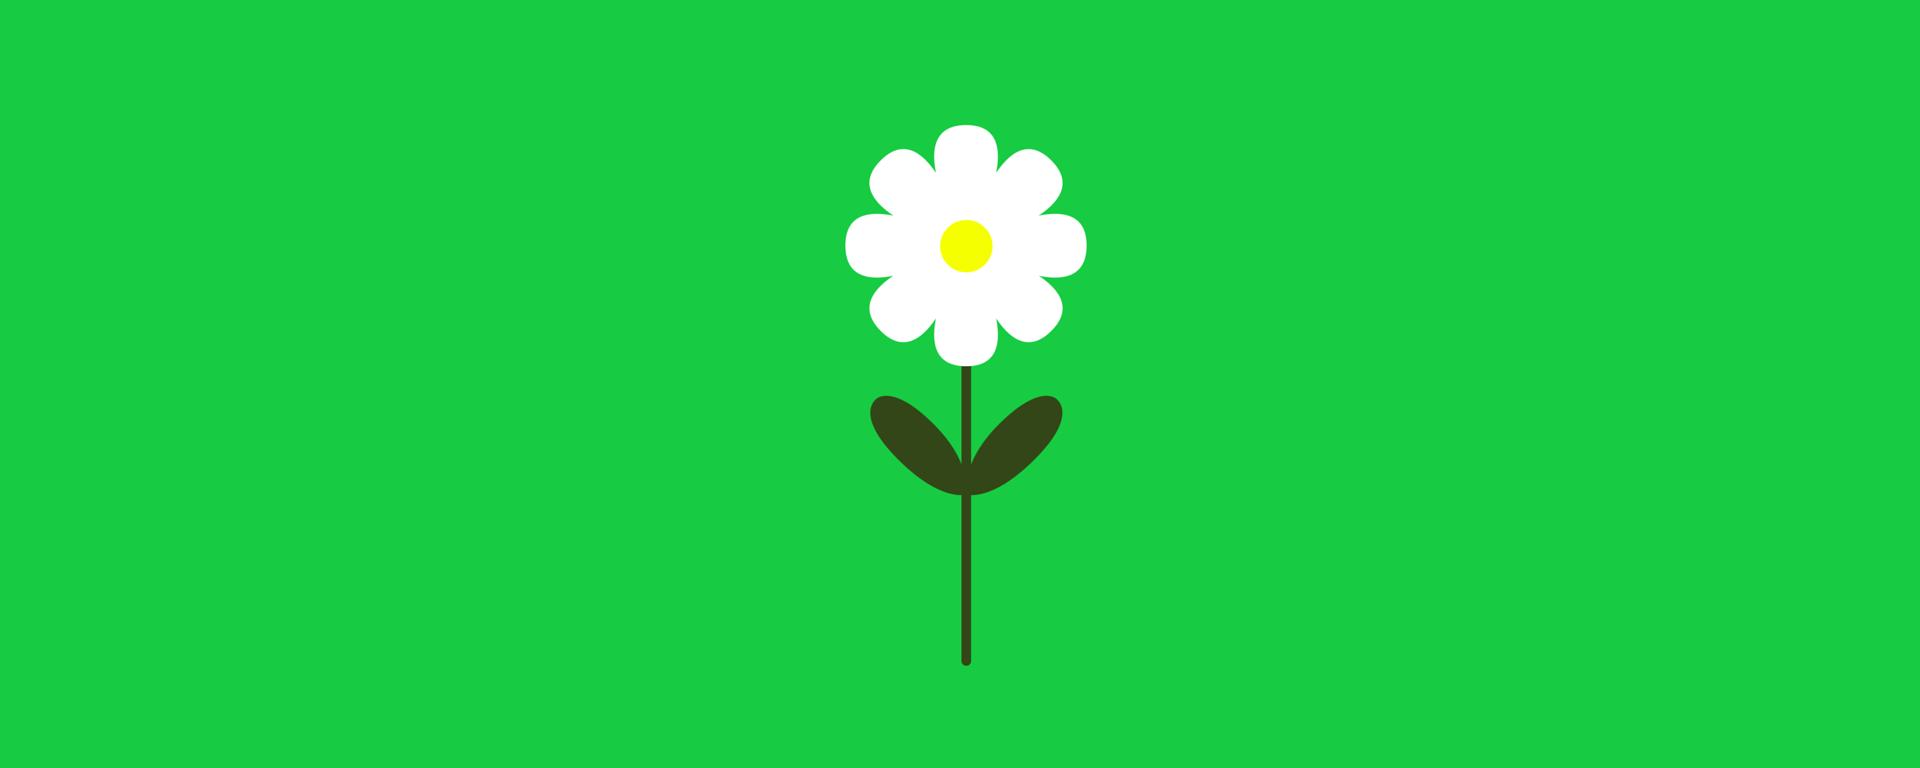 Margherita su sfondo verde